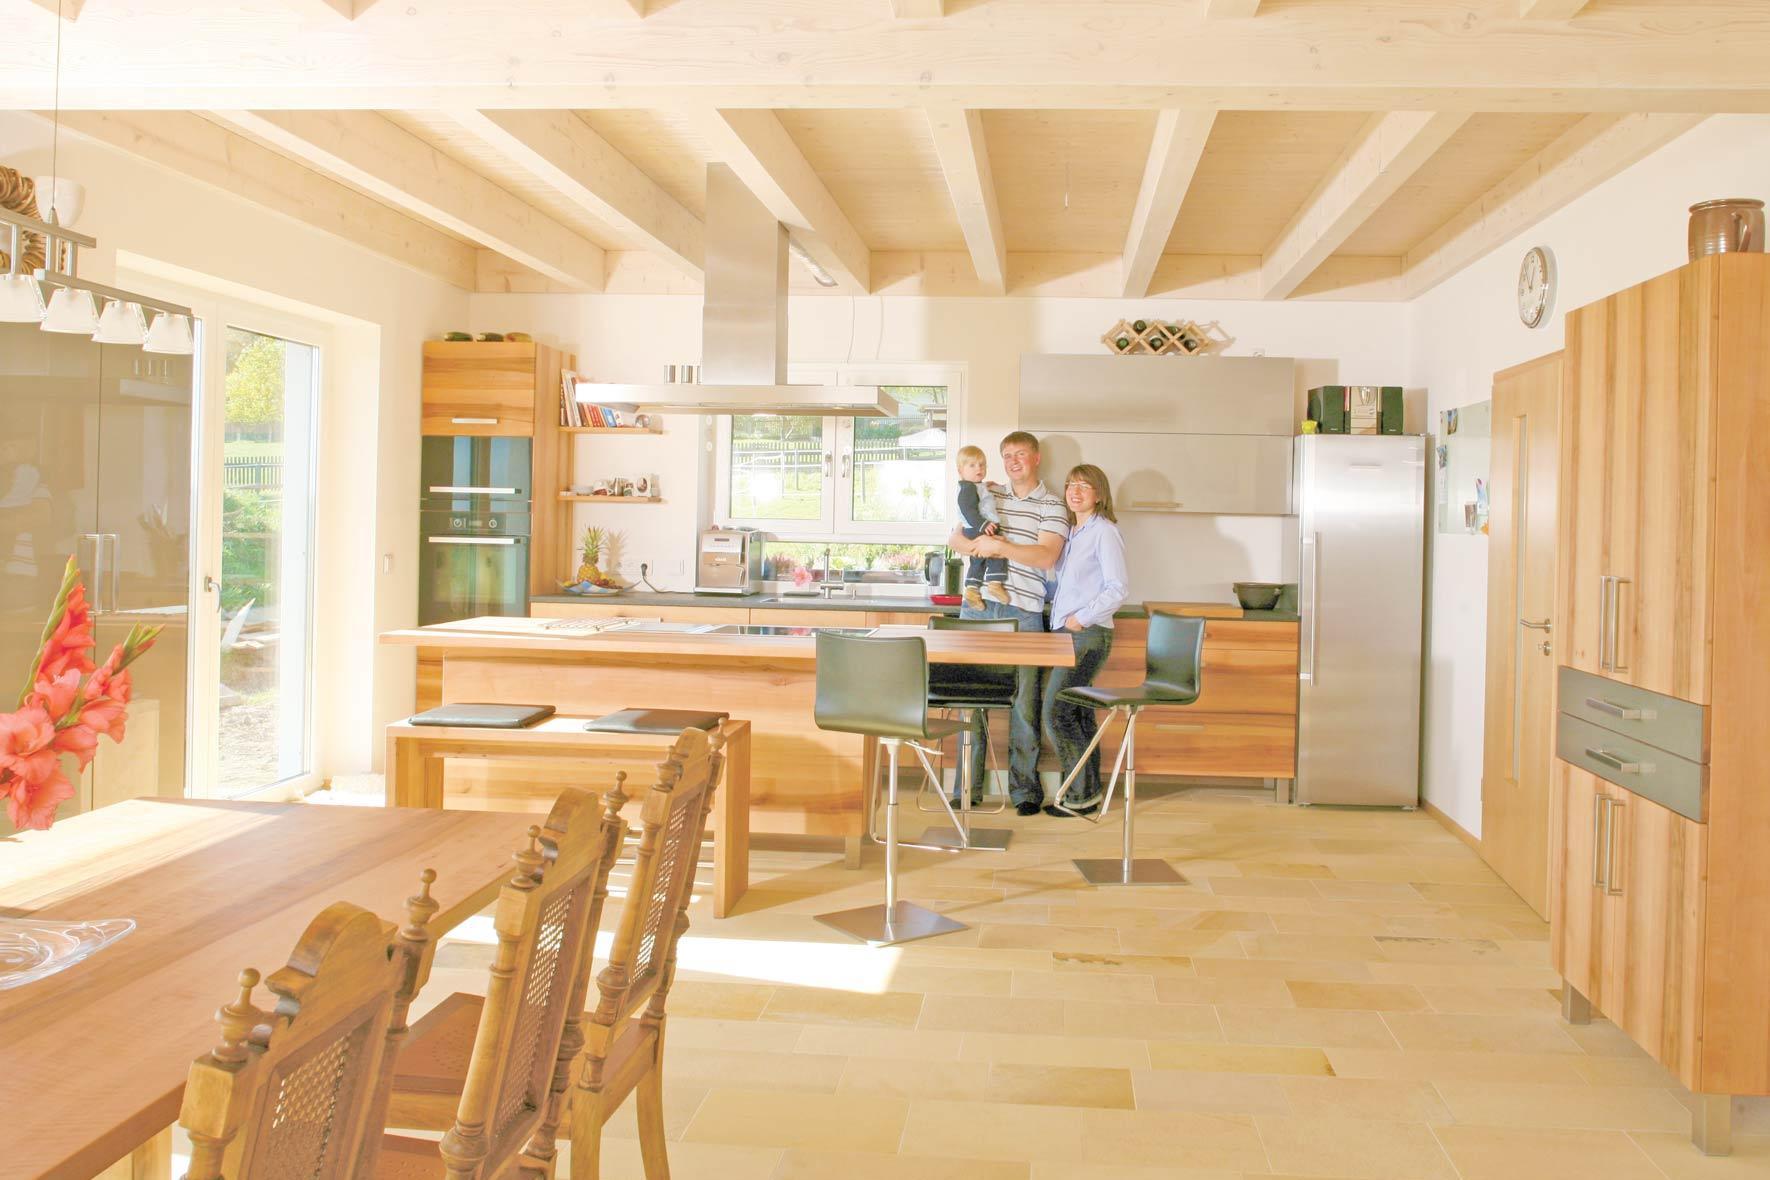 Massivholzküche In Elsbeere